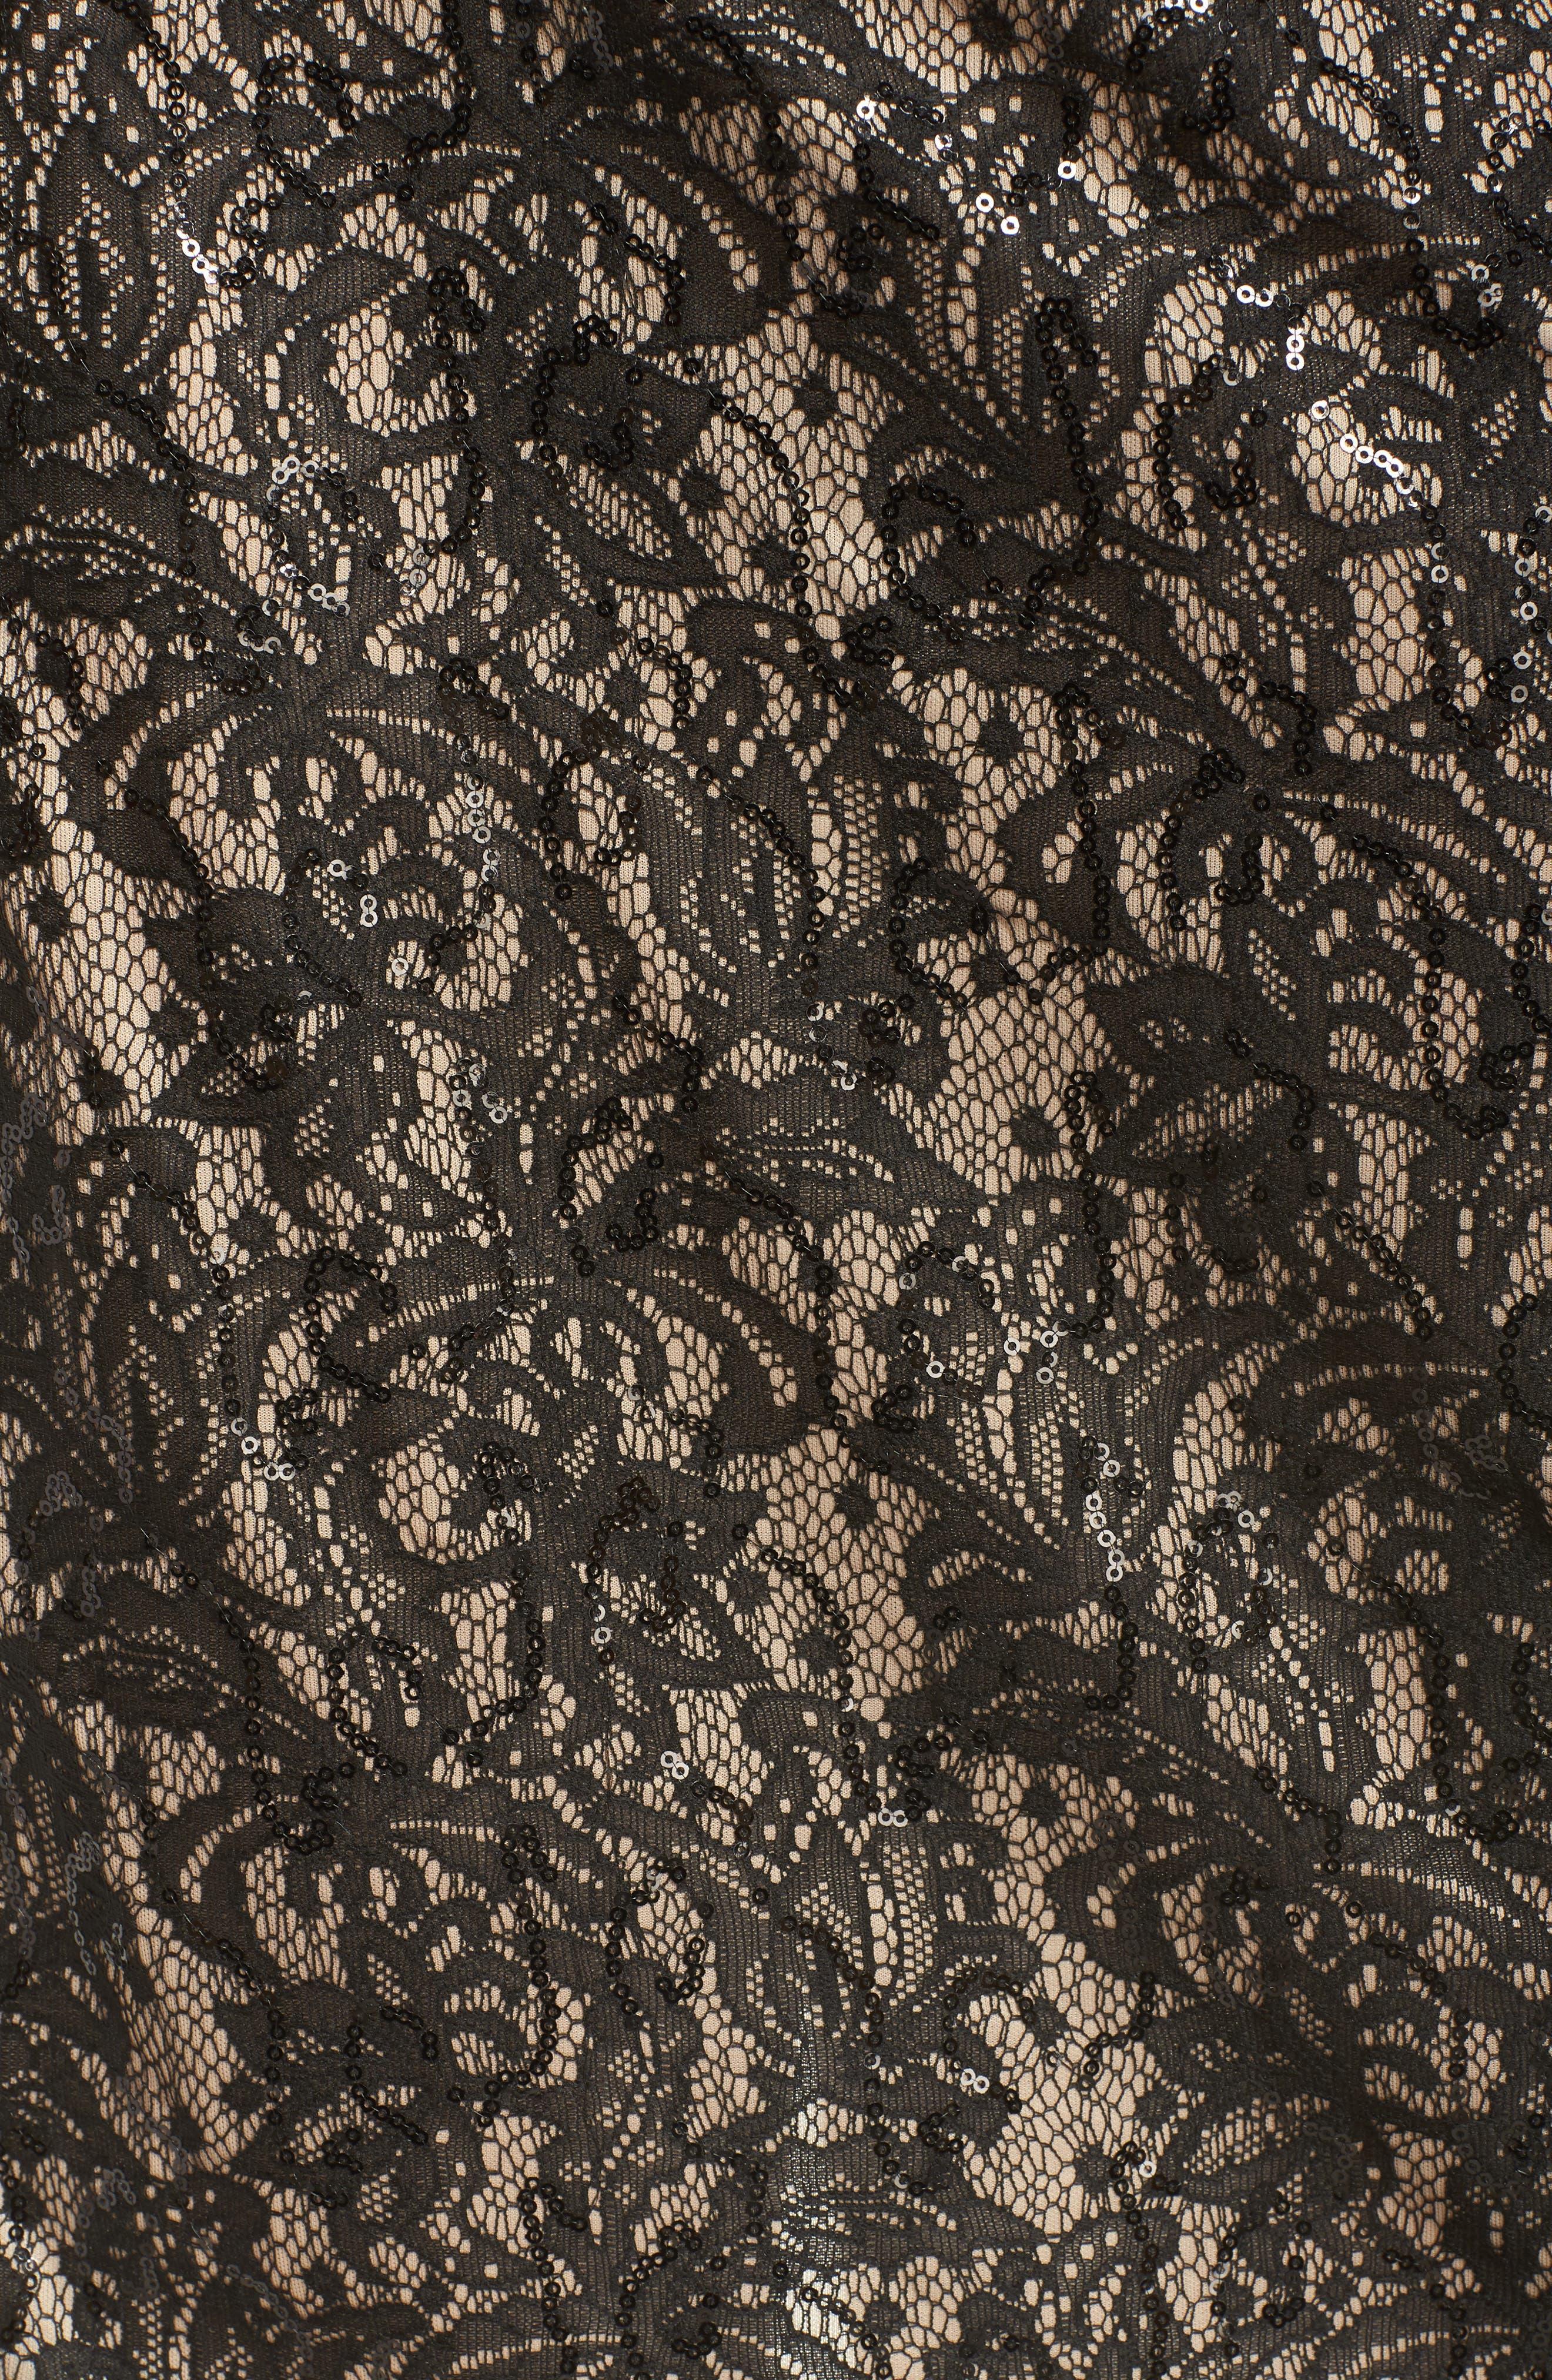 Off the Shoulder Lace Sheath Dress,                             Alternate thumbnail 6, color,                             BLACK TAN